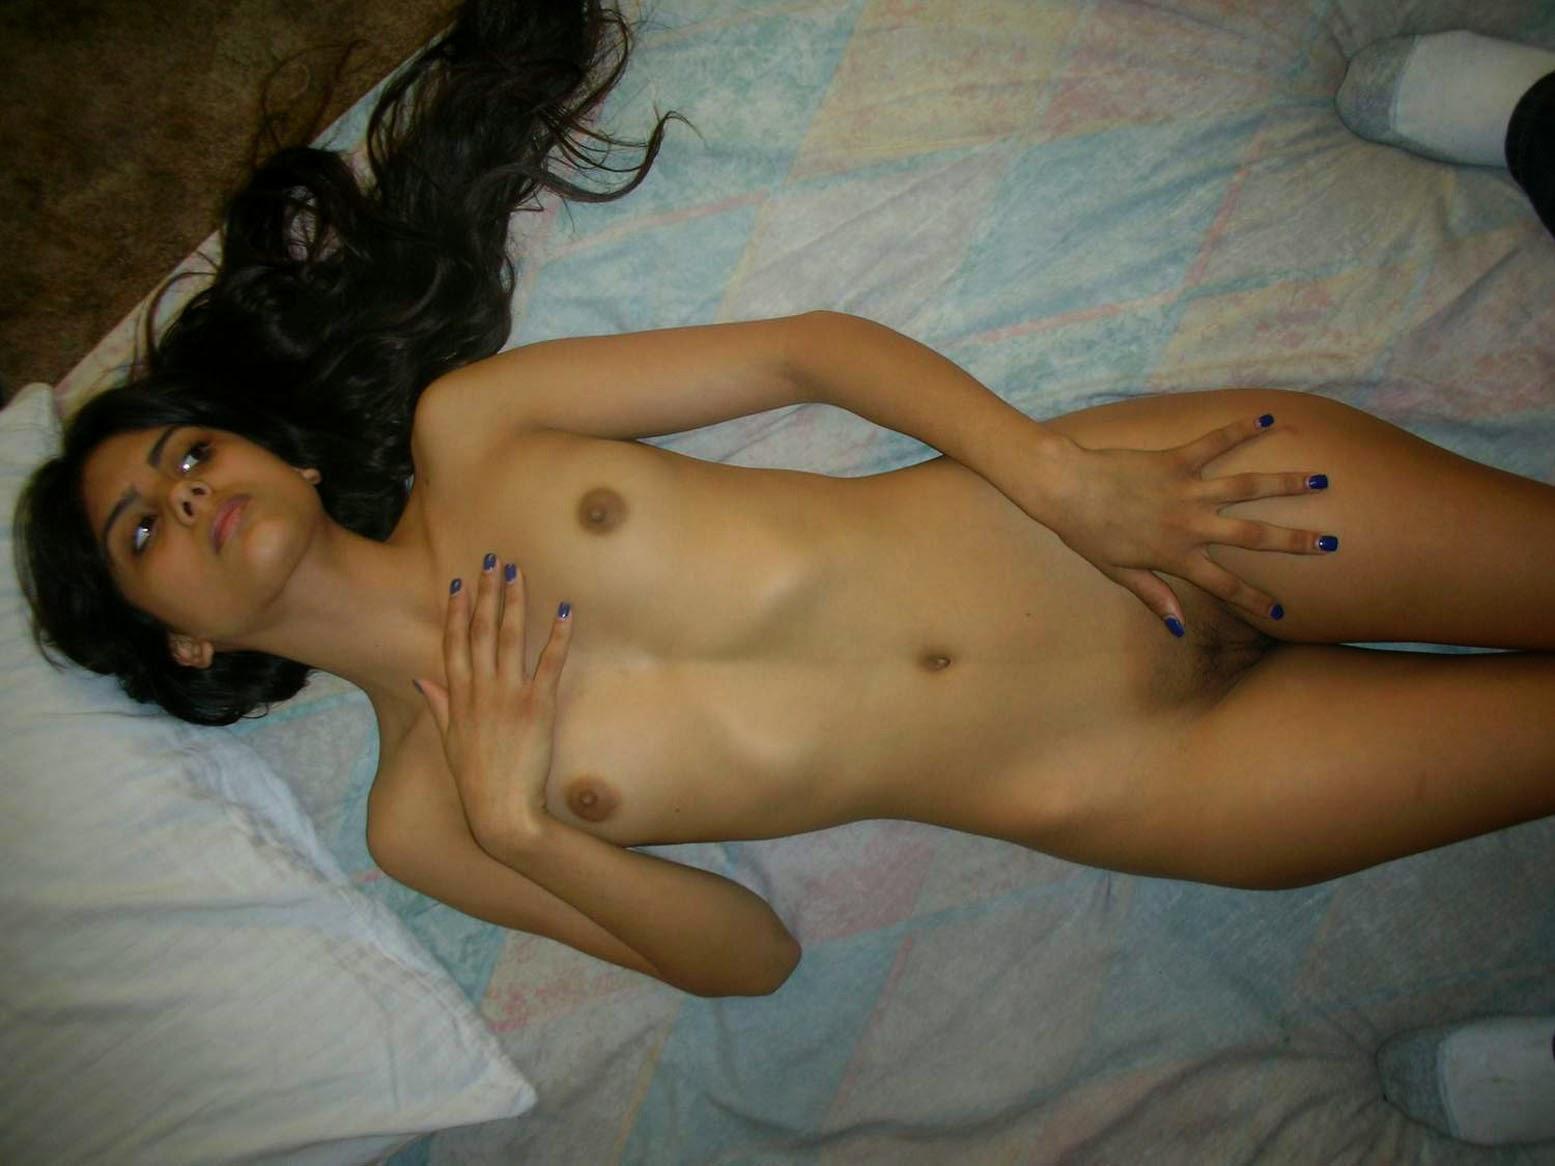 nude girlfriends video